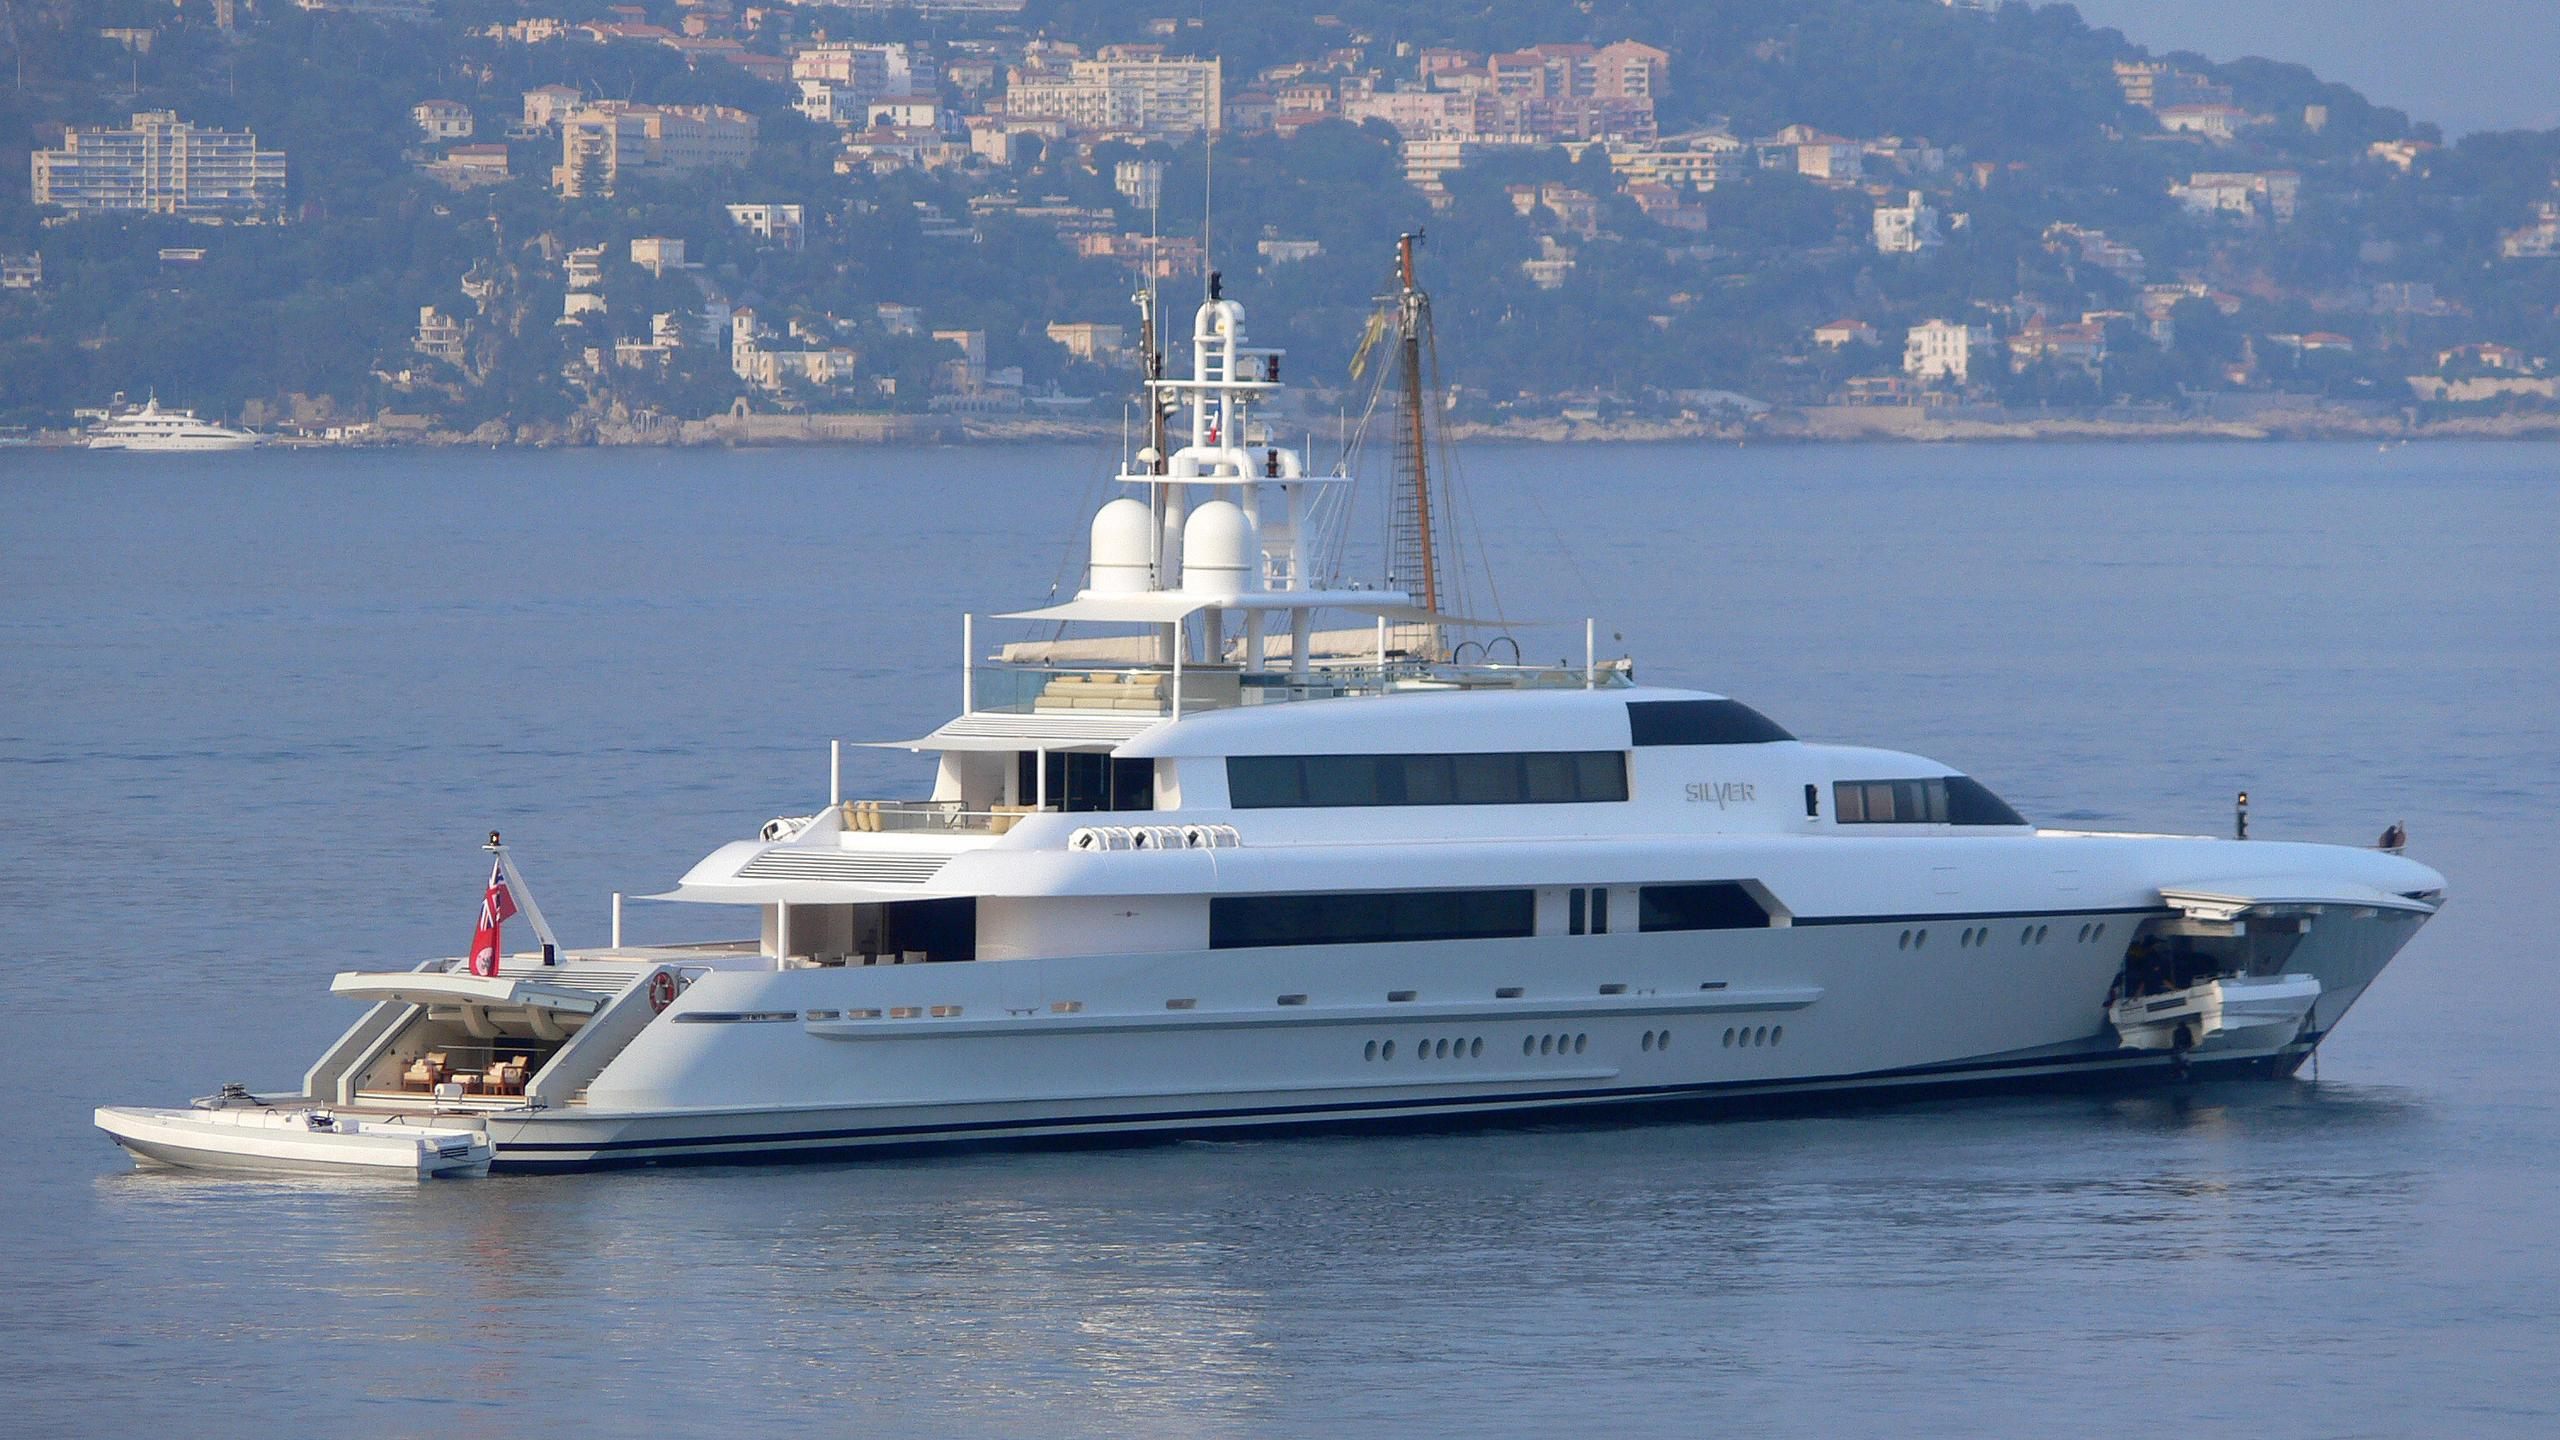 rabdan-motor-yacht-silver-2007-73m-profile-moored